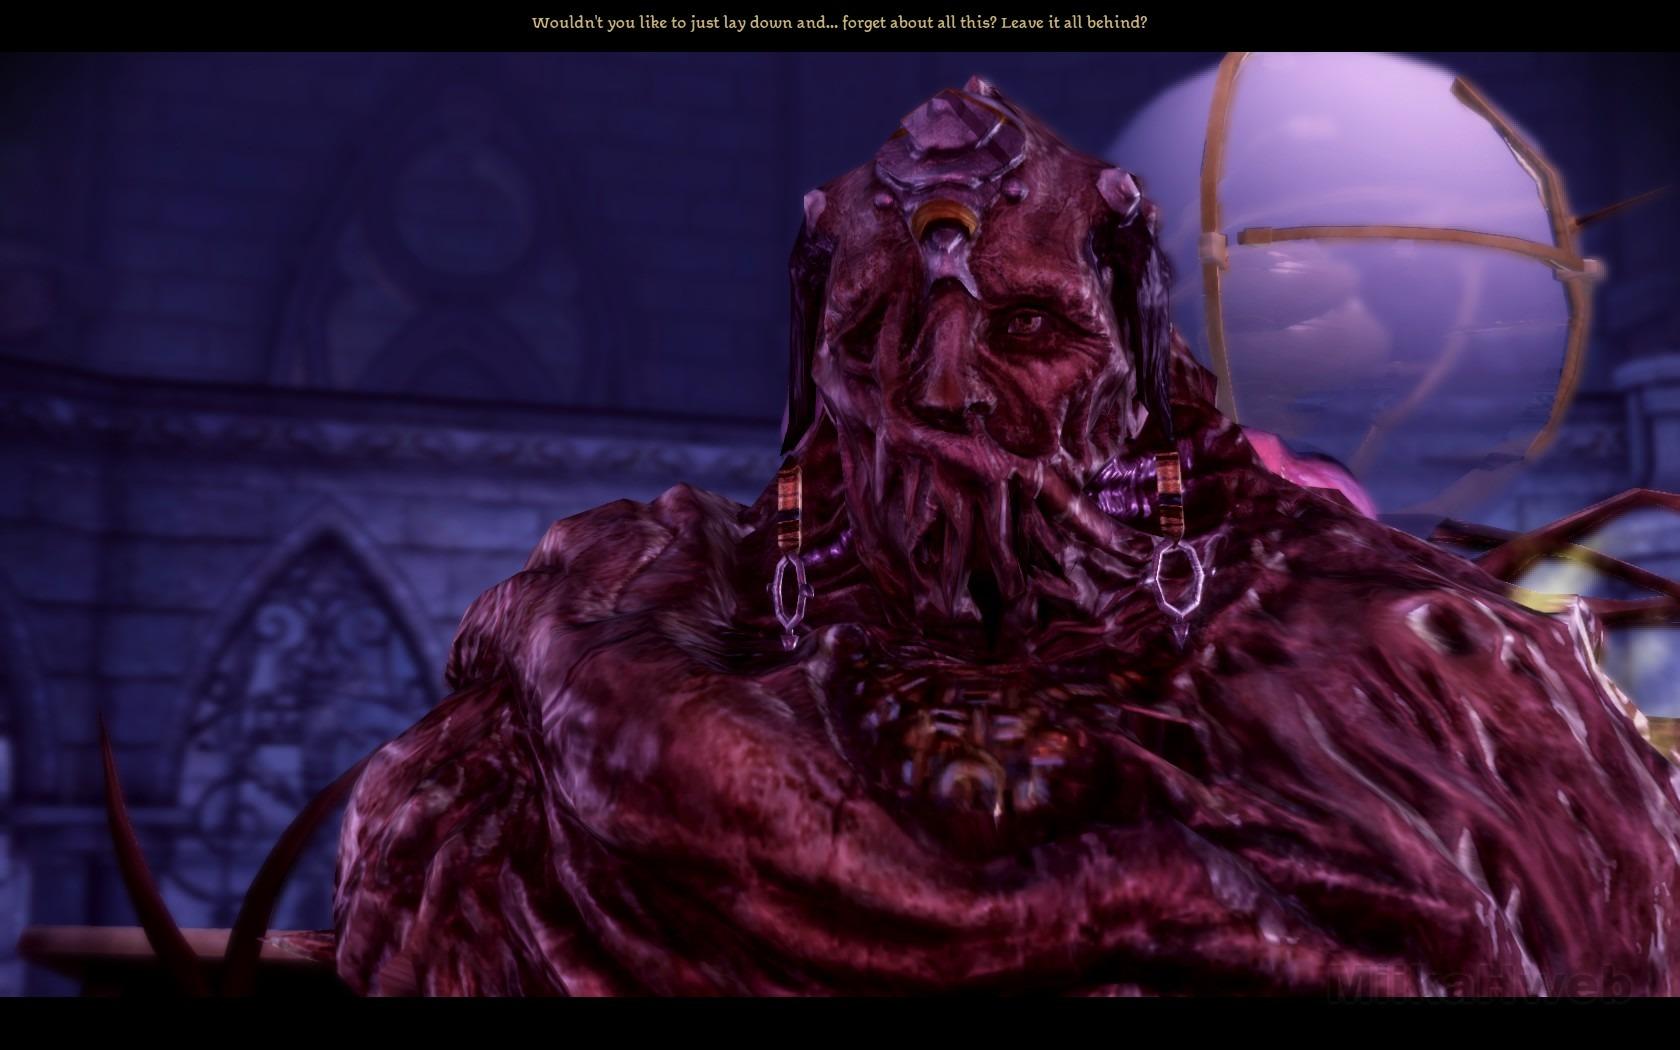 MiikaHweb - Game : Dragon Age: Origins